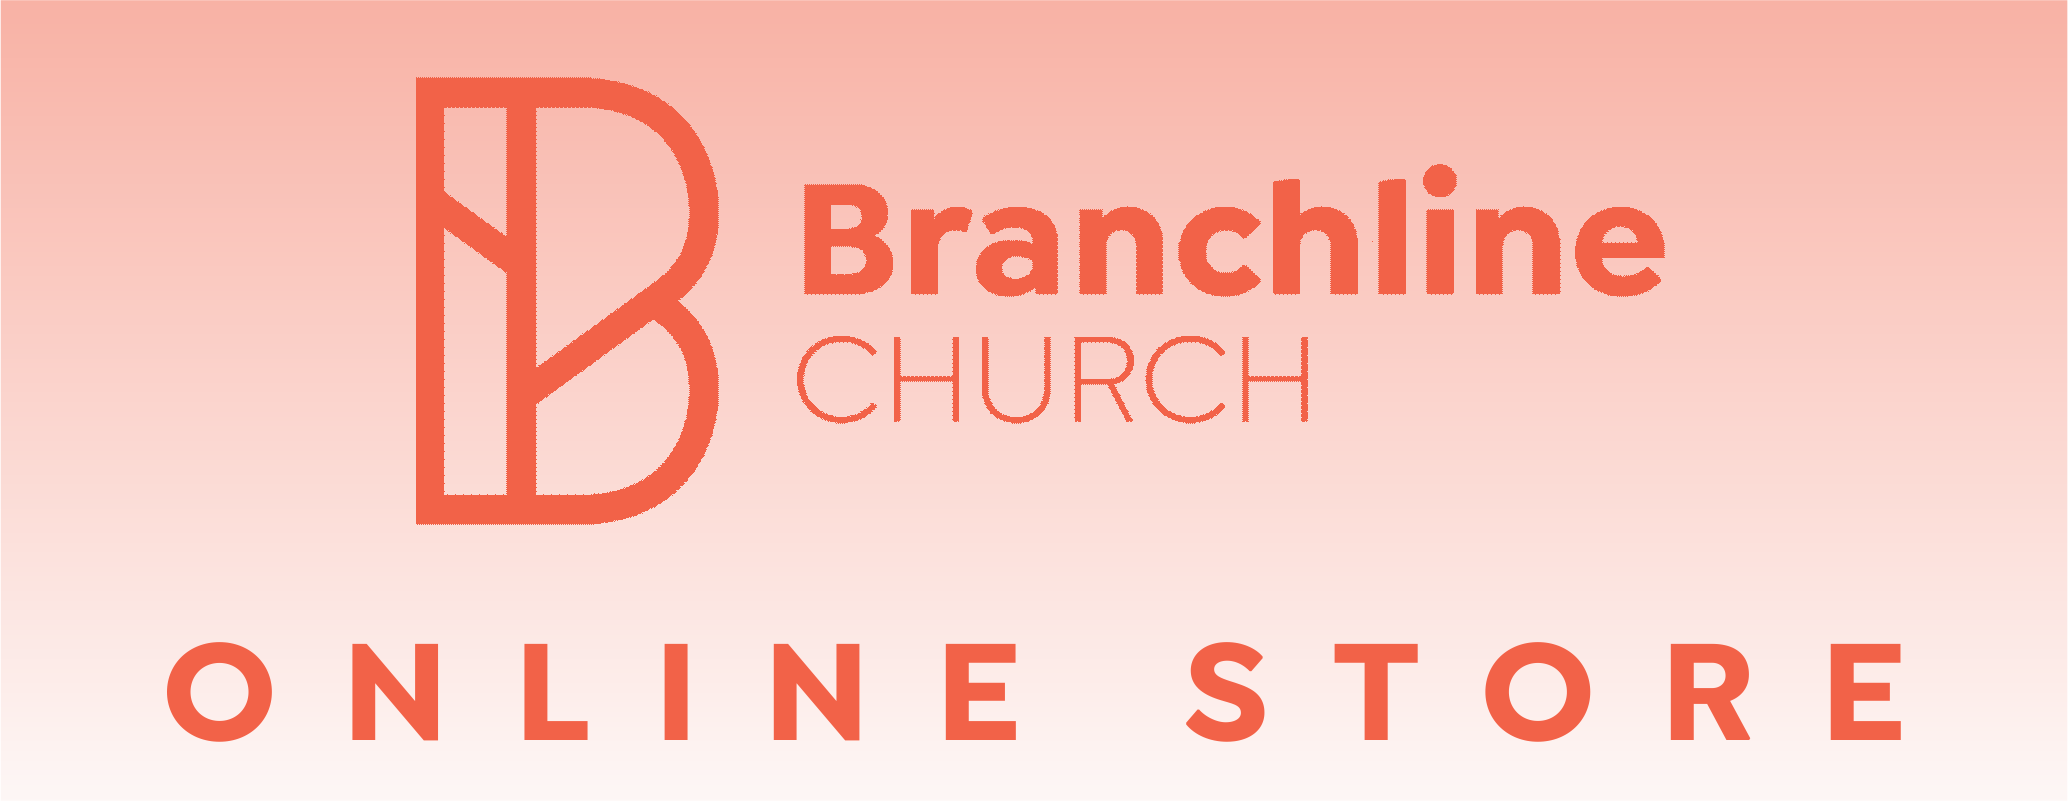 branchline-online-store.png